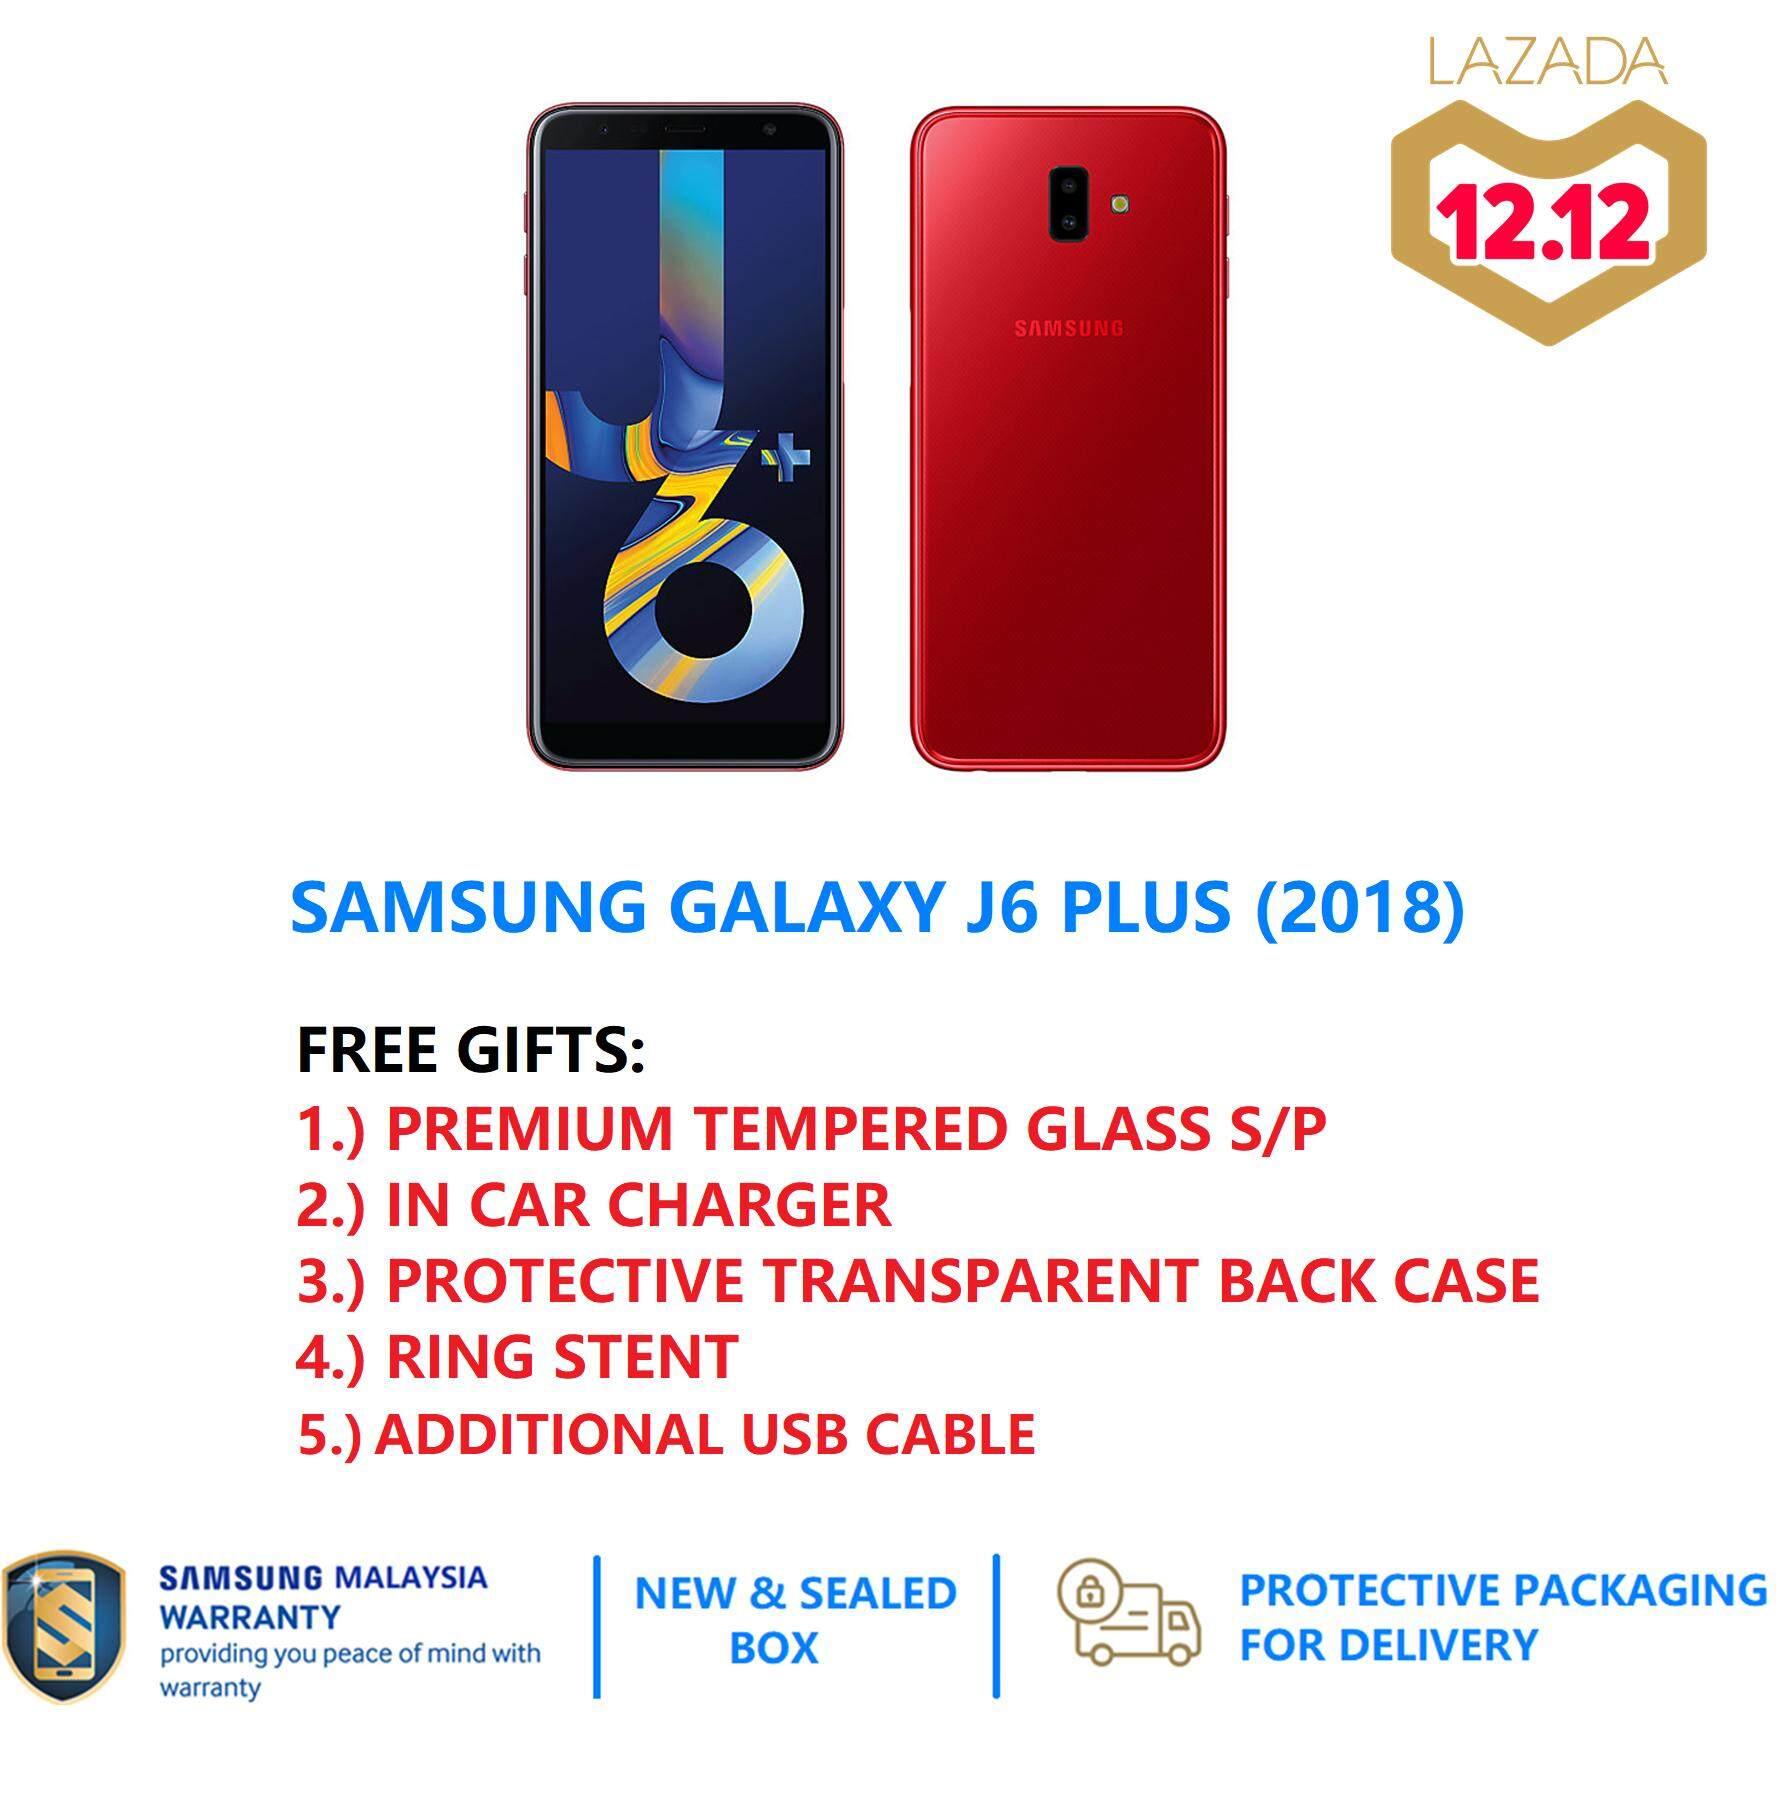 Grab Original Samsung Mobiles Tablets On Lazada My J100 Galaxy J1 4 Gb Free Gifts J6 Plus 4g Lte 4gb Ram 64gb